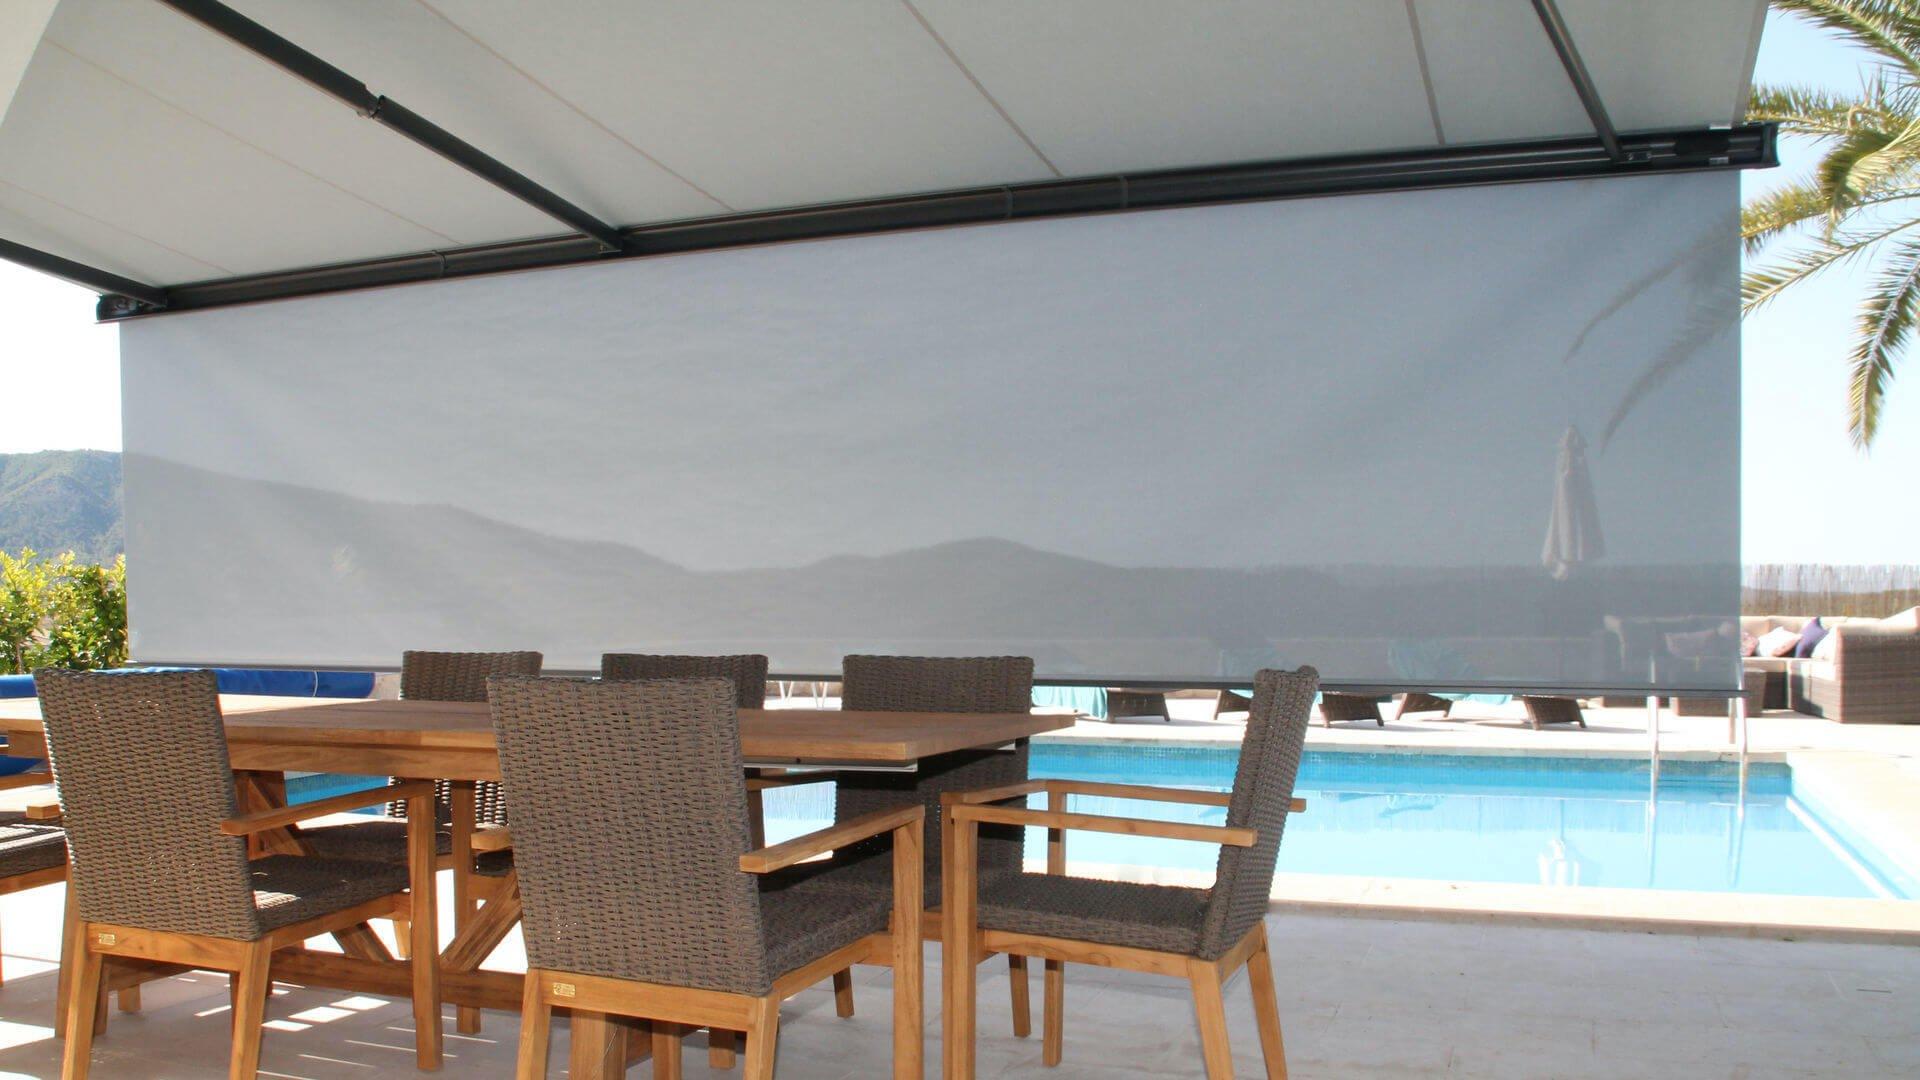 Markilux 6000 toldo deplegado terraza